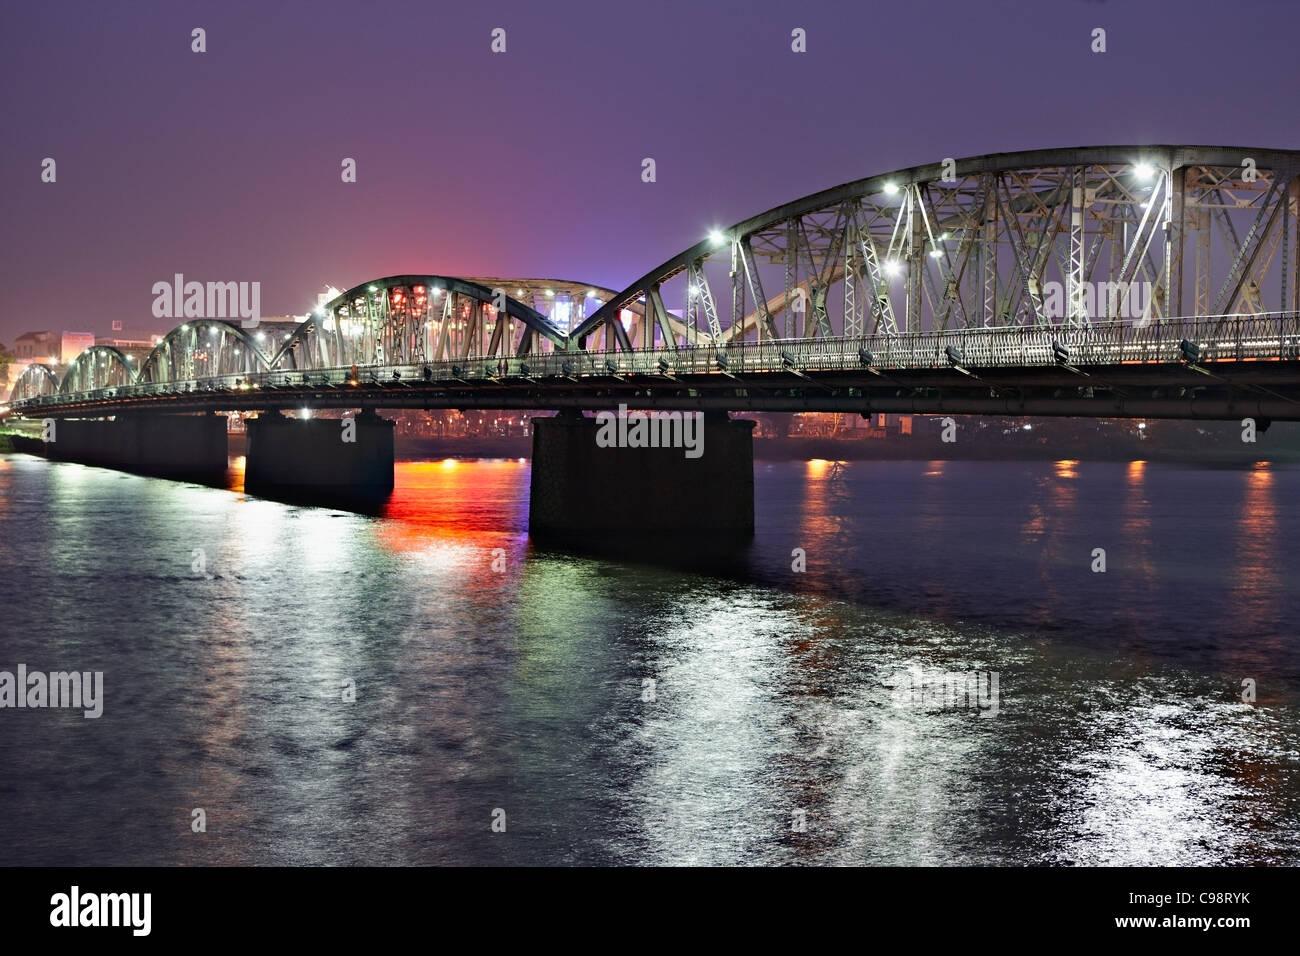 Illuminated Trang Tien Bridge over Perfume River, Hue, Vietnam - Stock Image